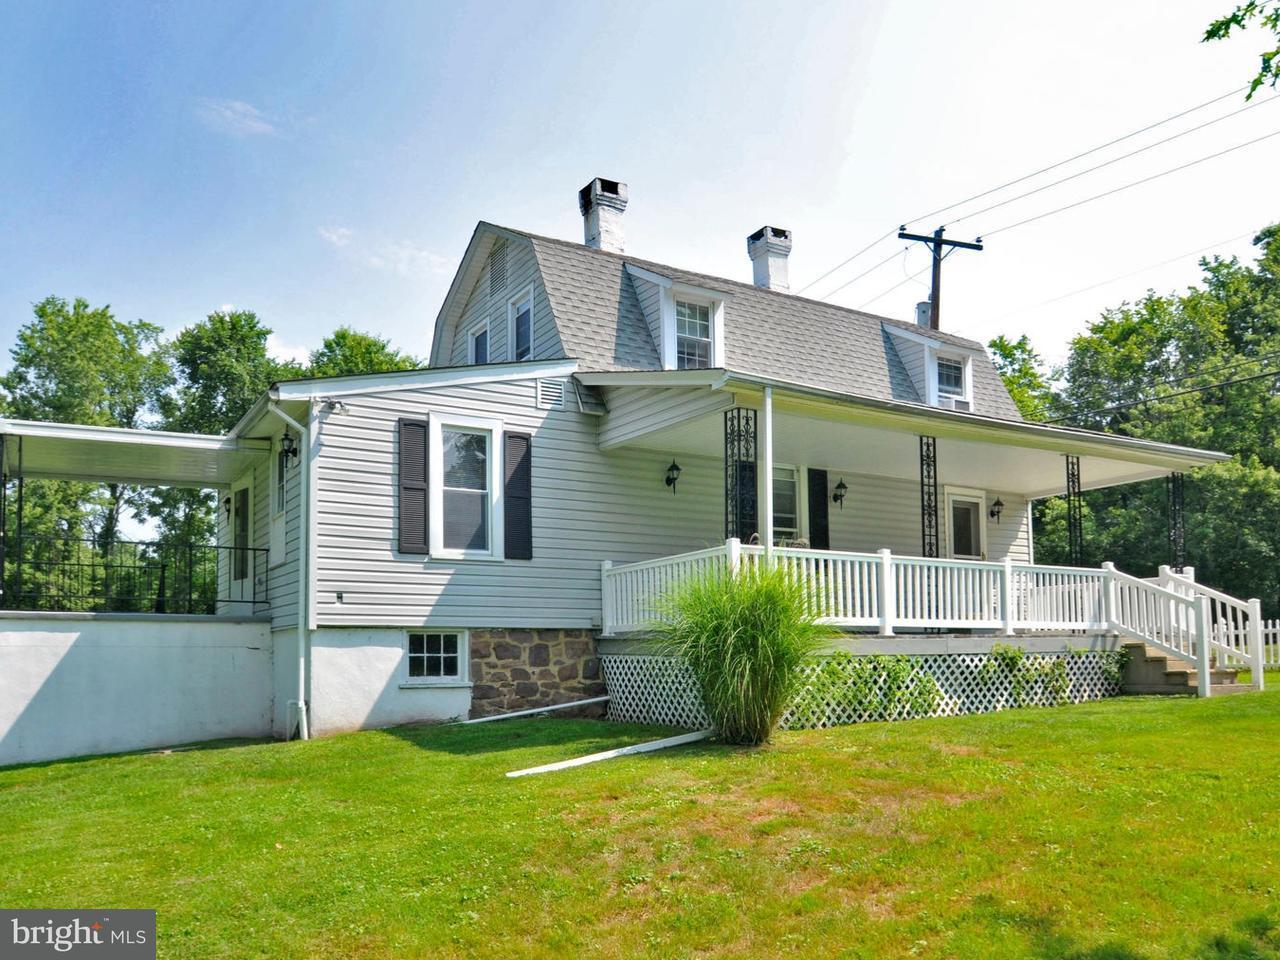 Casa Unifamiliar por un Alquiler en 941 LIMEKILN PIKE Ambler, Pennsylvania 19002 Estados Unidos